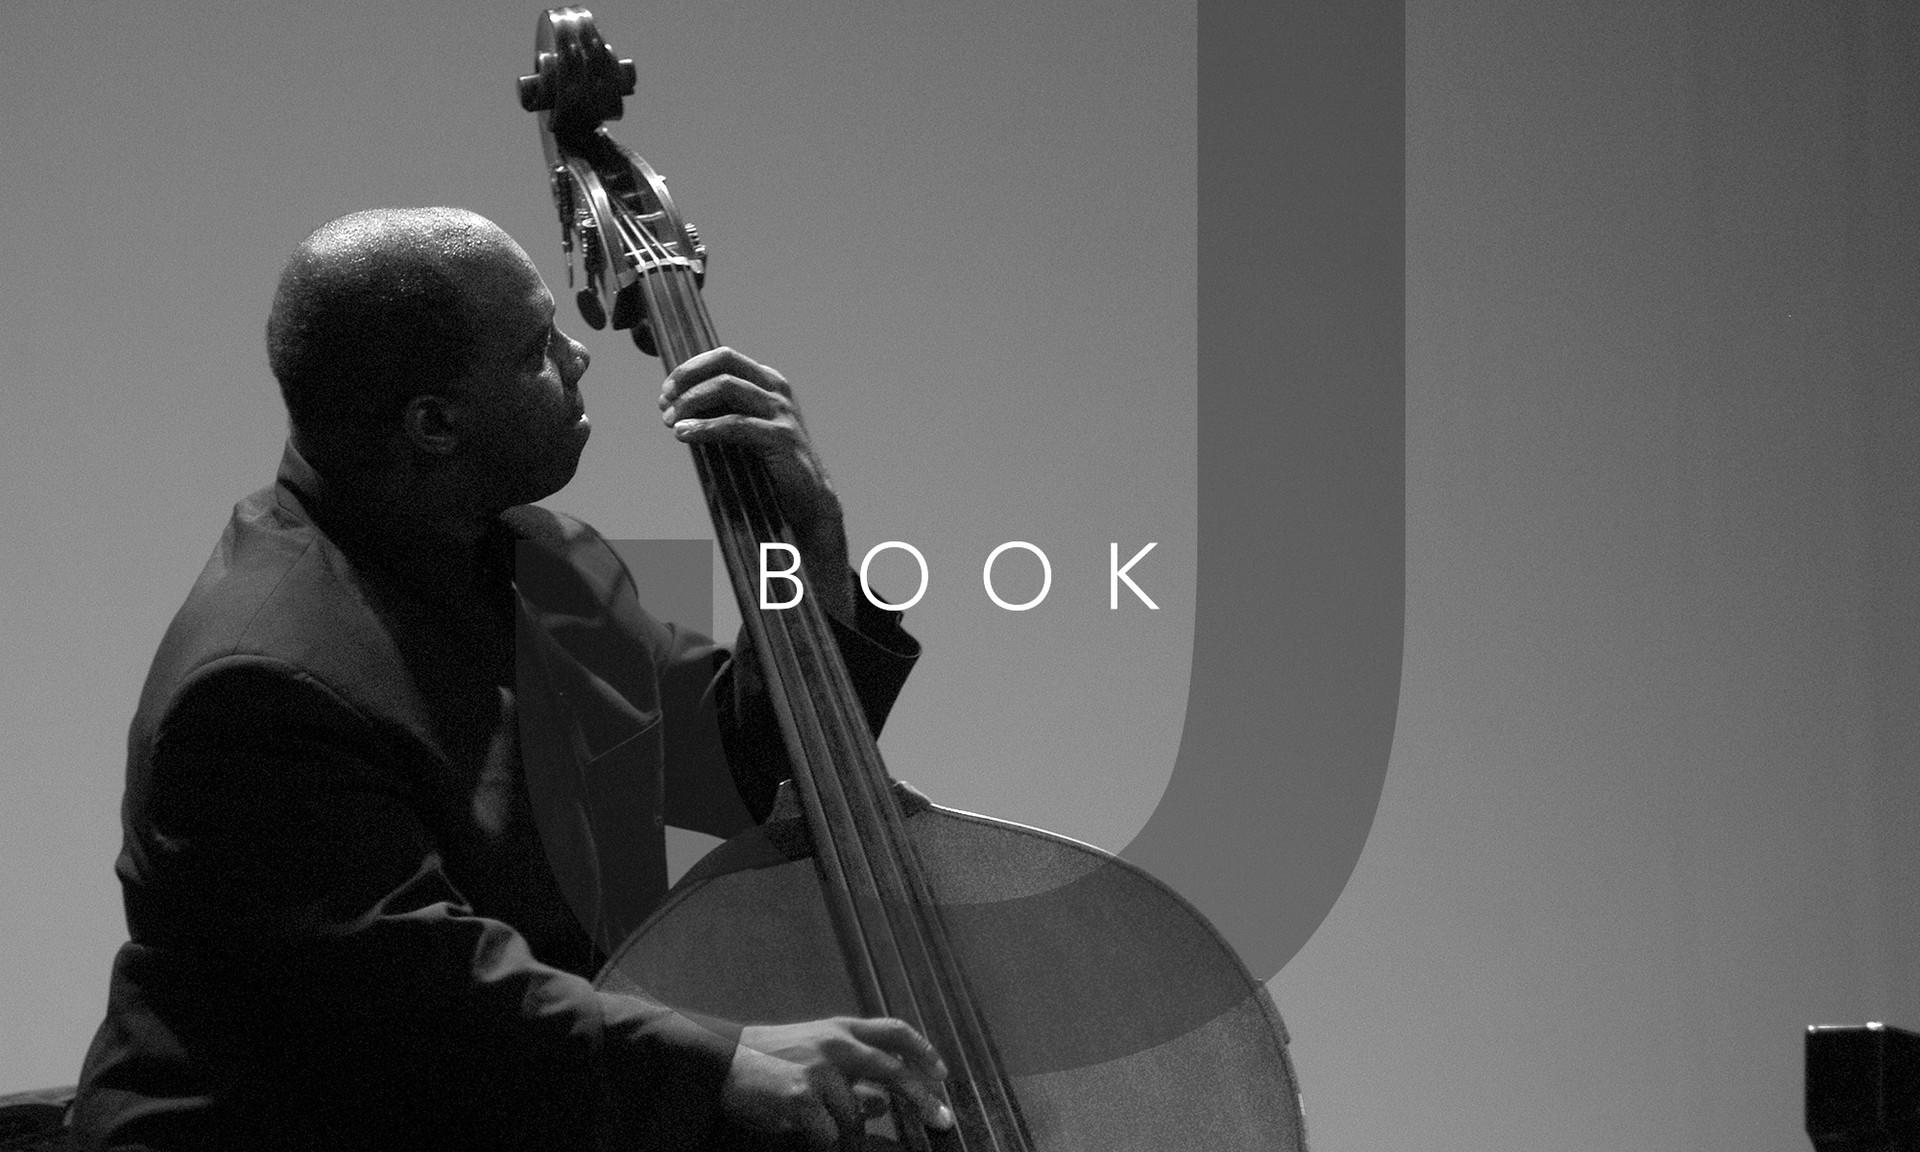 j-book-prevignano-logo3.jpg